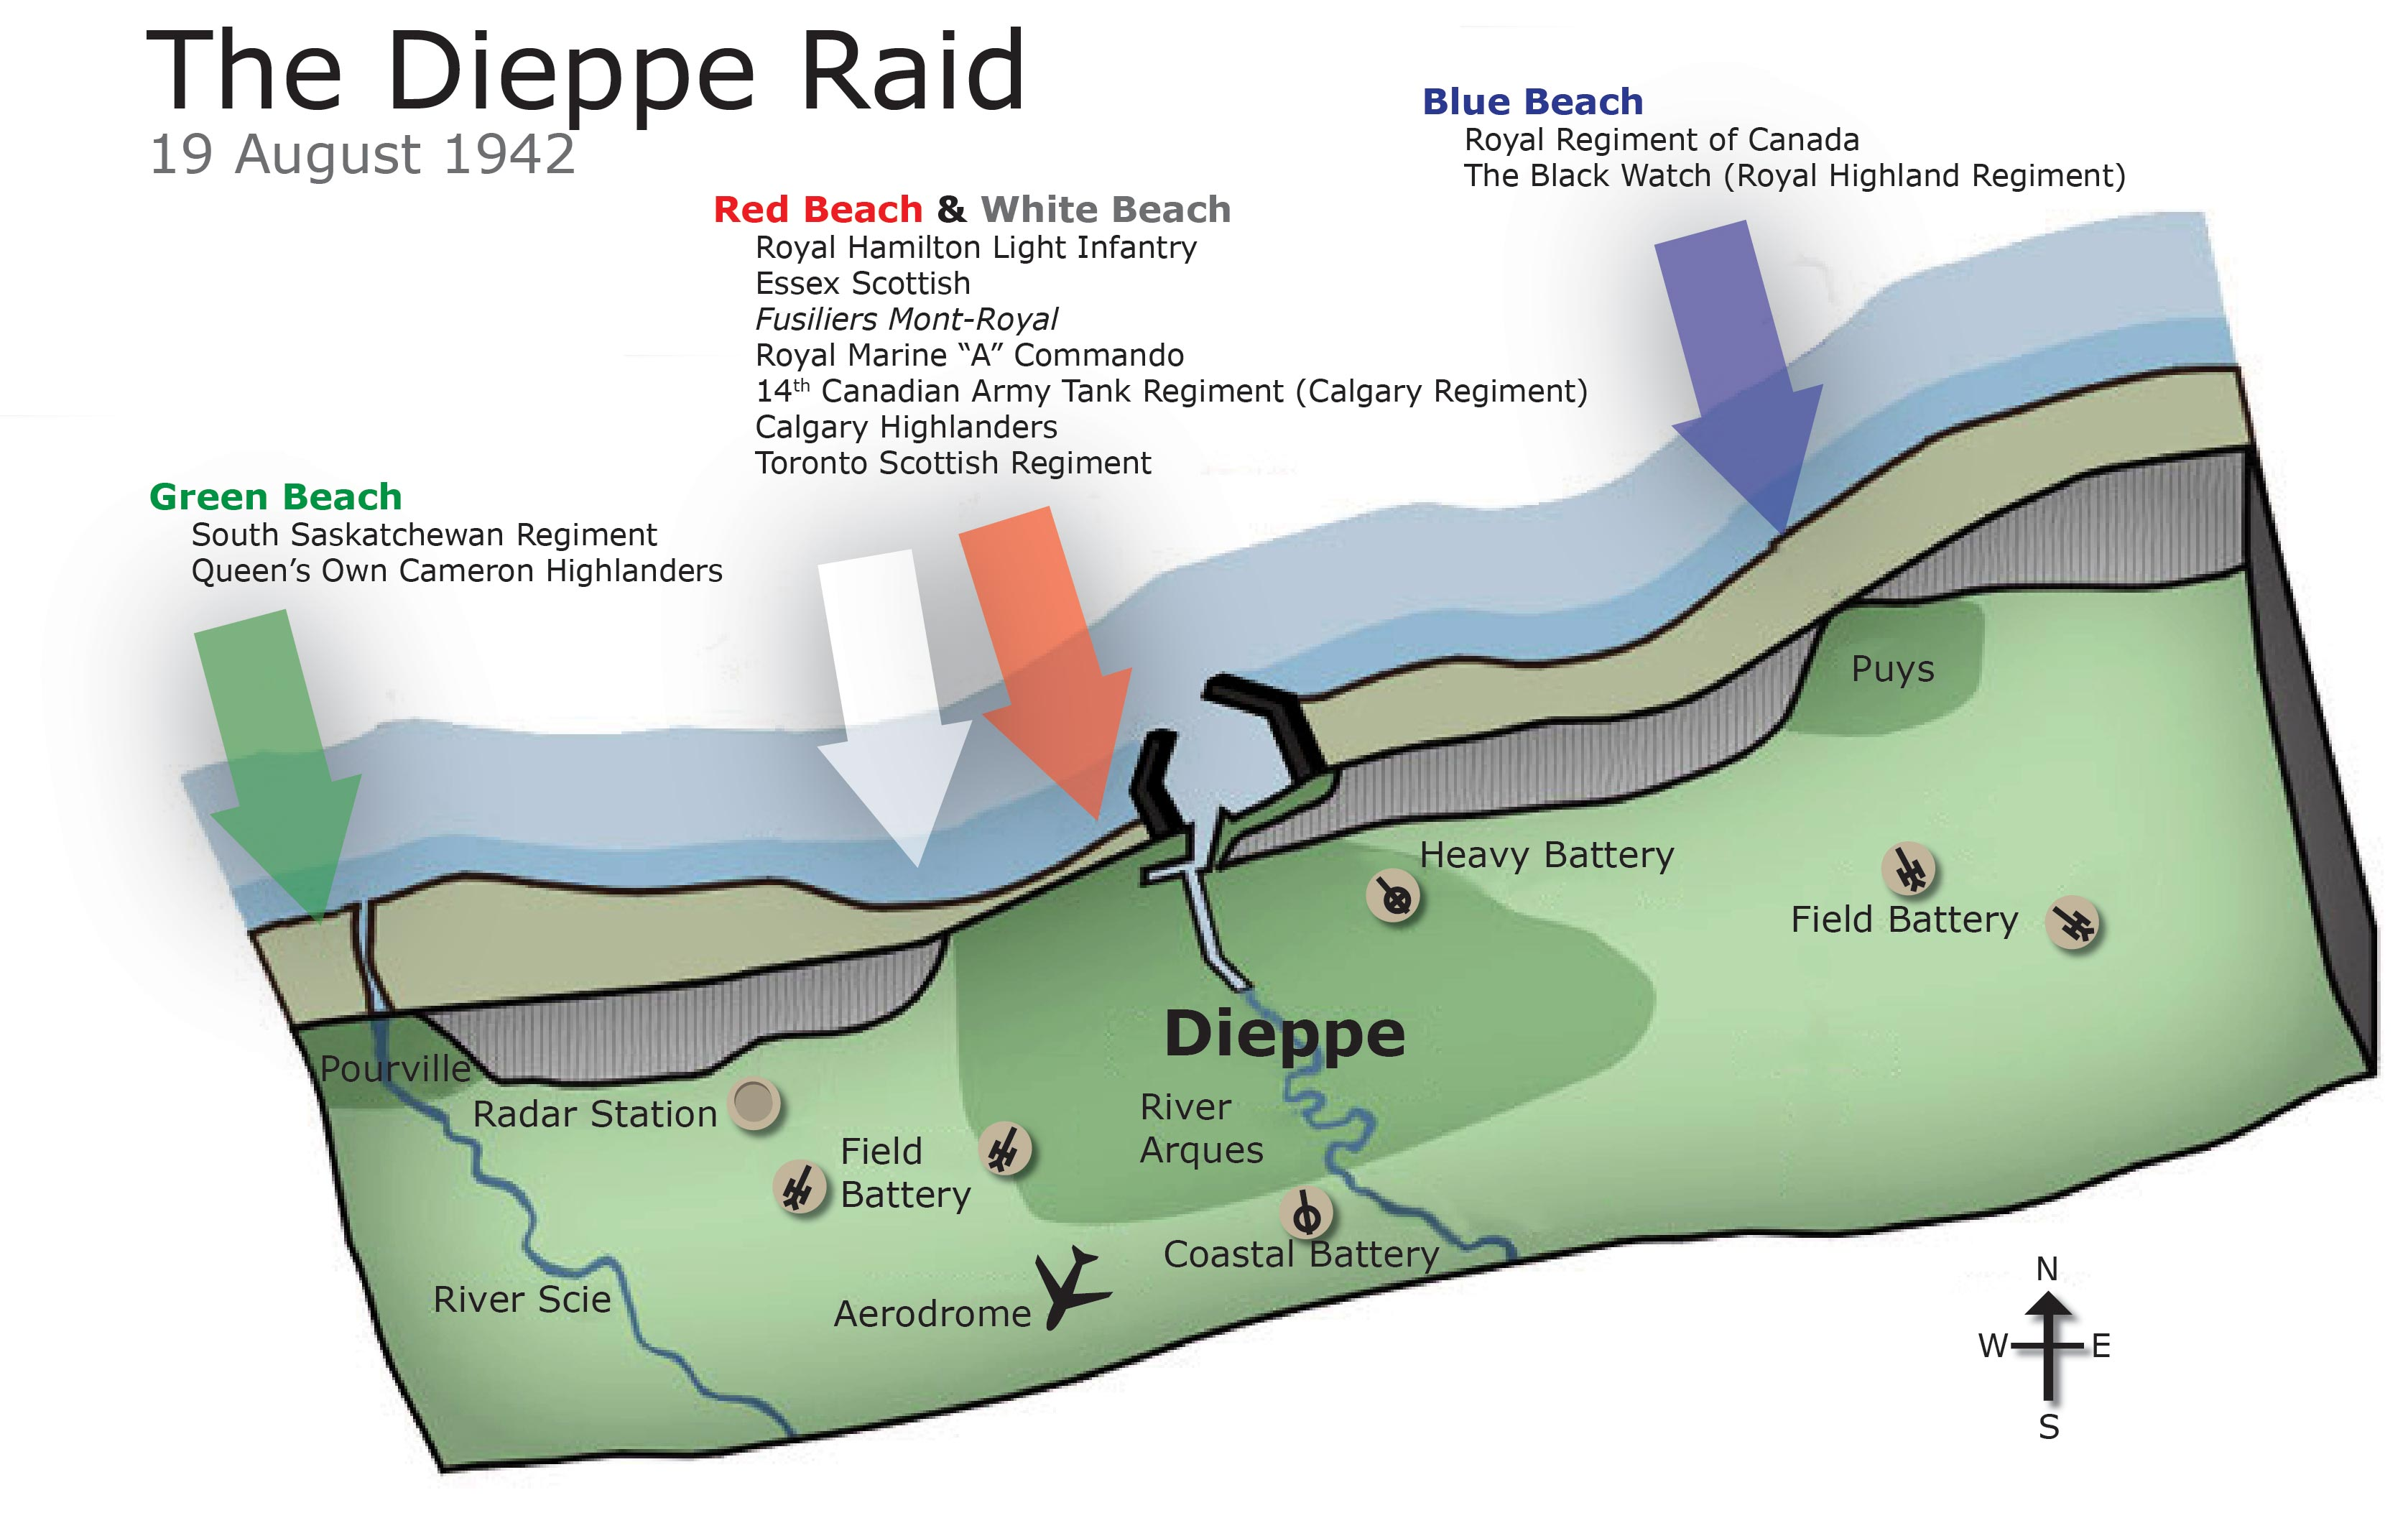 Map of the Dieppe Raid